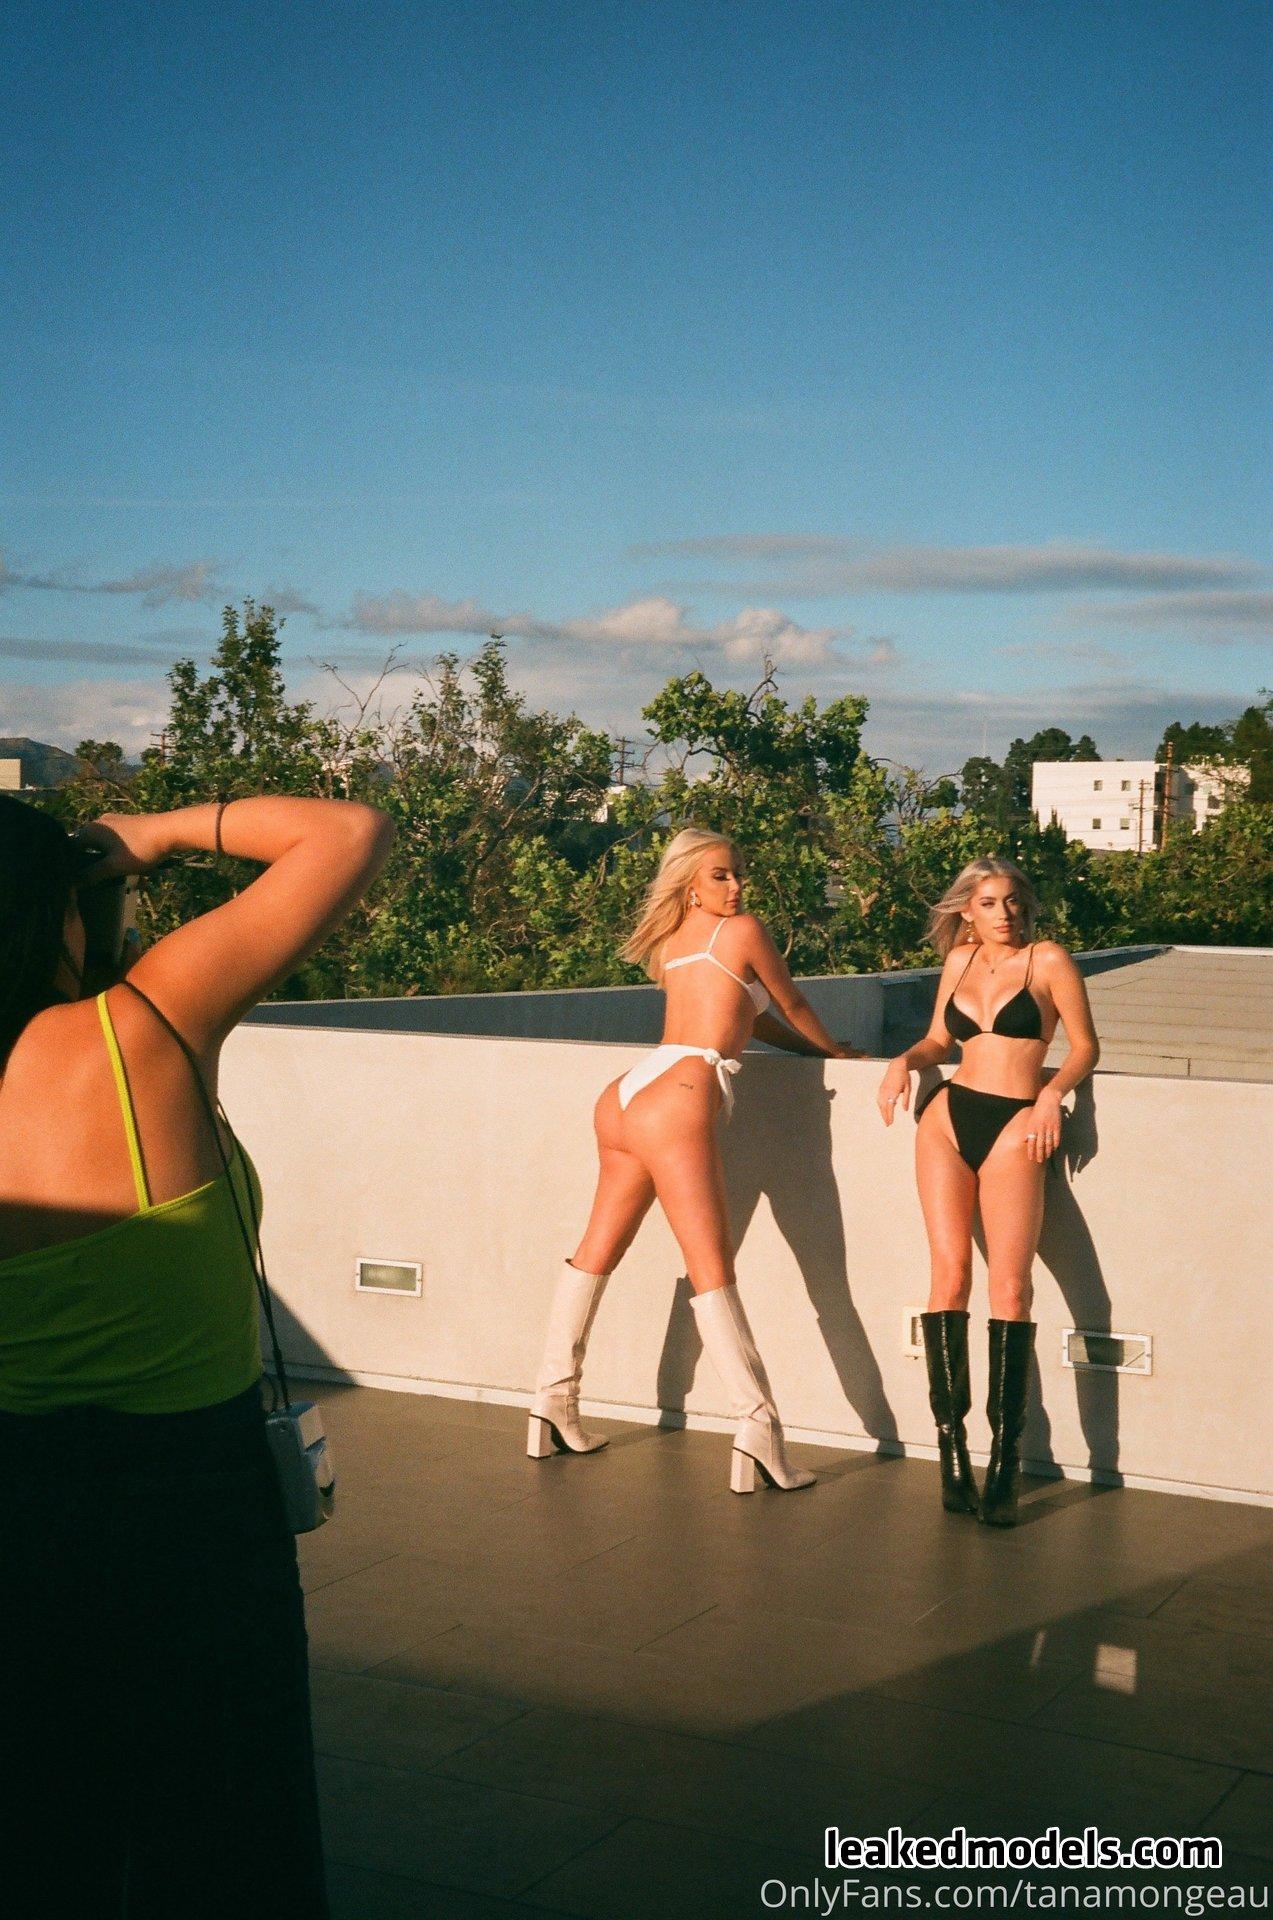 Tana Mongeau – tanamongeau OnlyFans Nude Leaks (34 Photos)